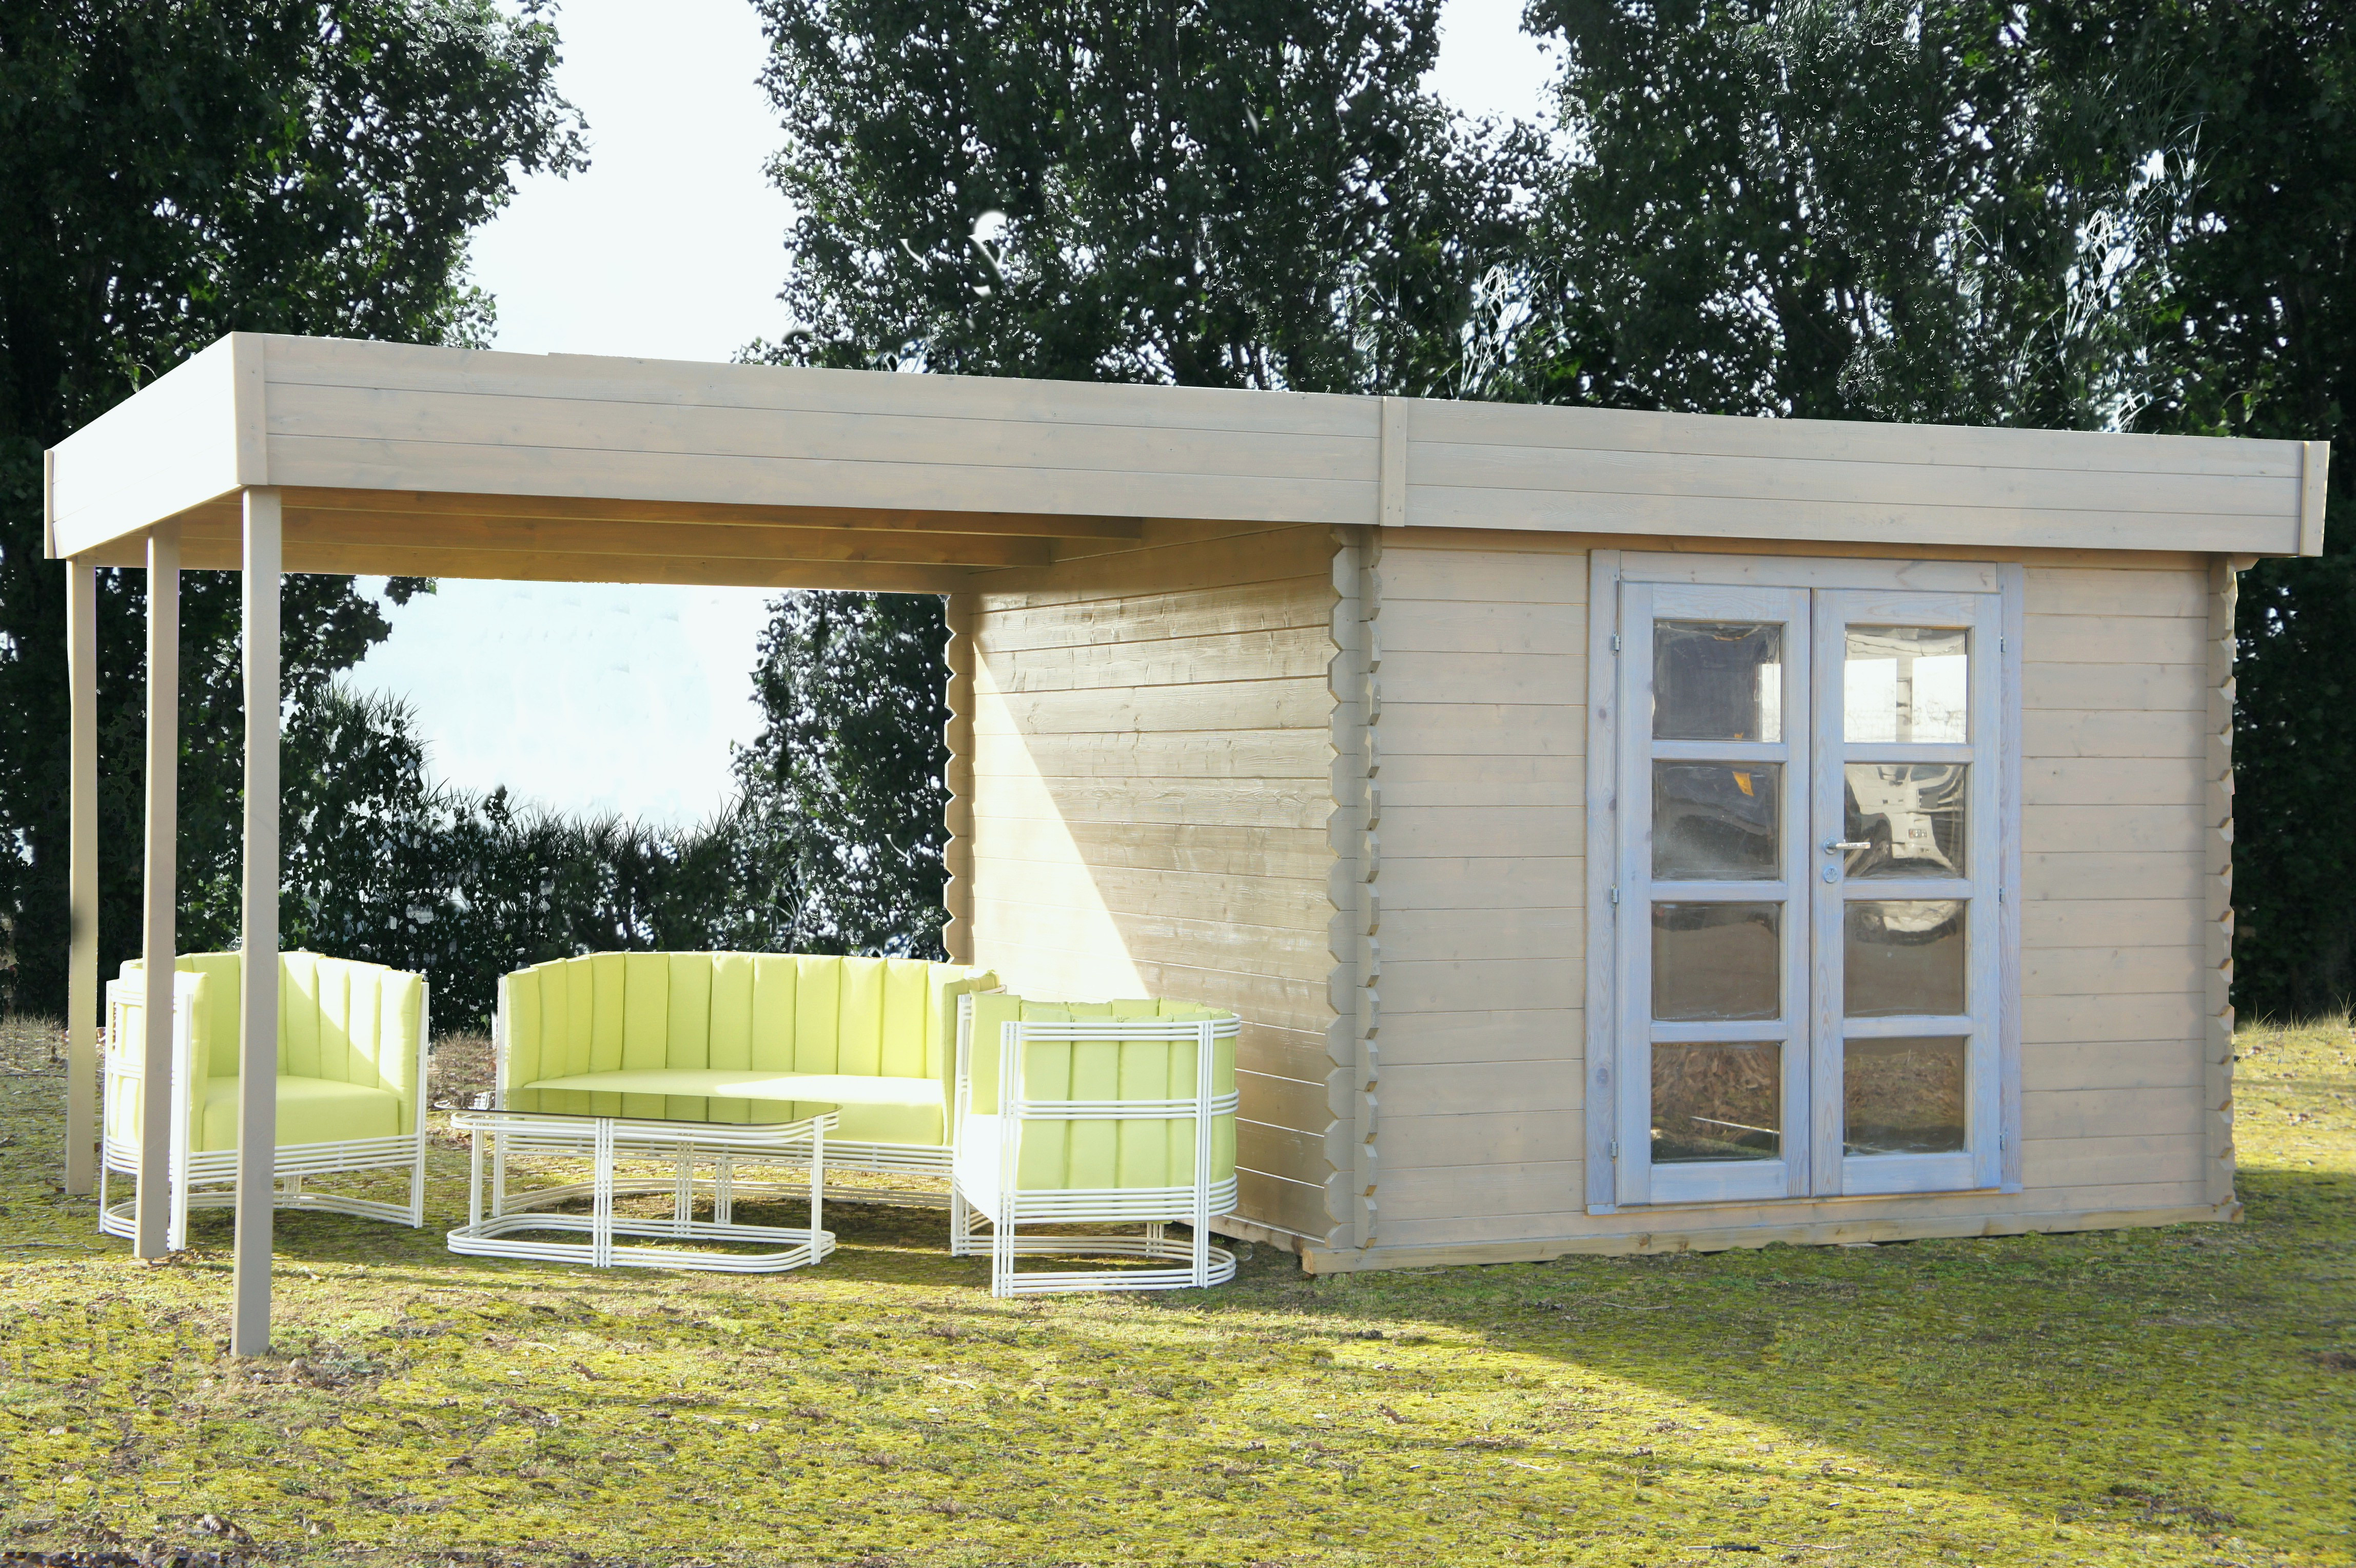 Brico Depot Salon De Jardin 2017 Beau Stock Chaise De Jardin En Teck Luxe Plan Abri Jardin Bois De Traditionnel